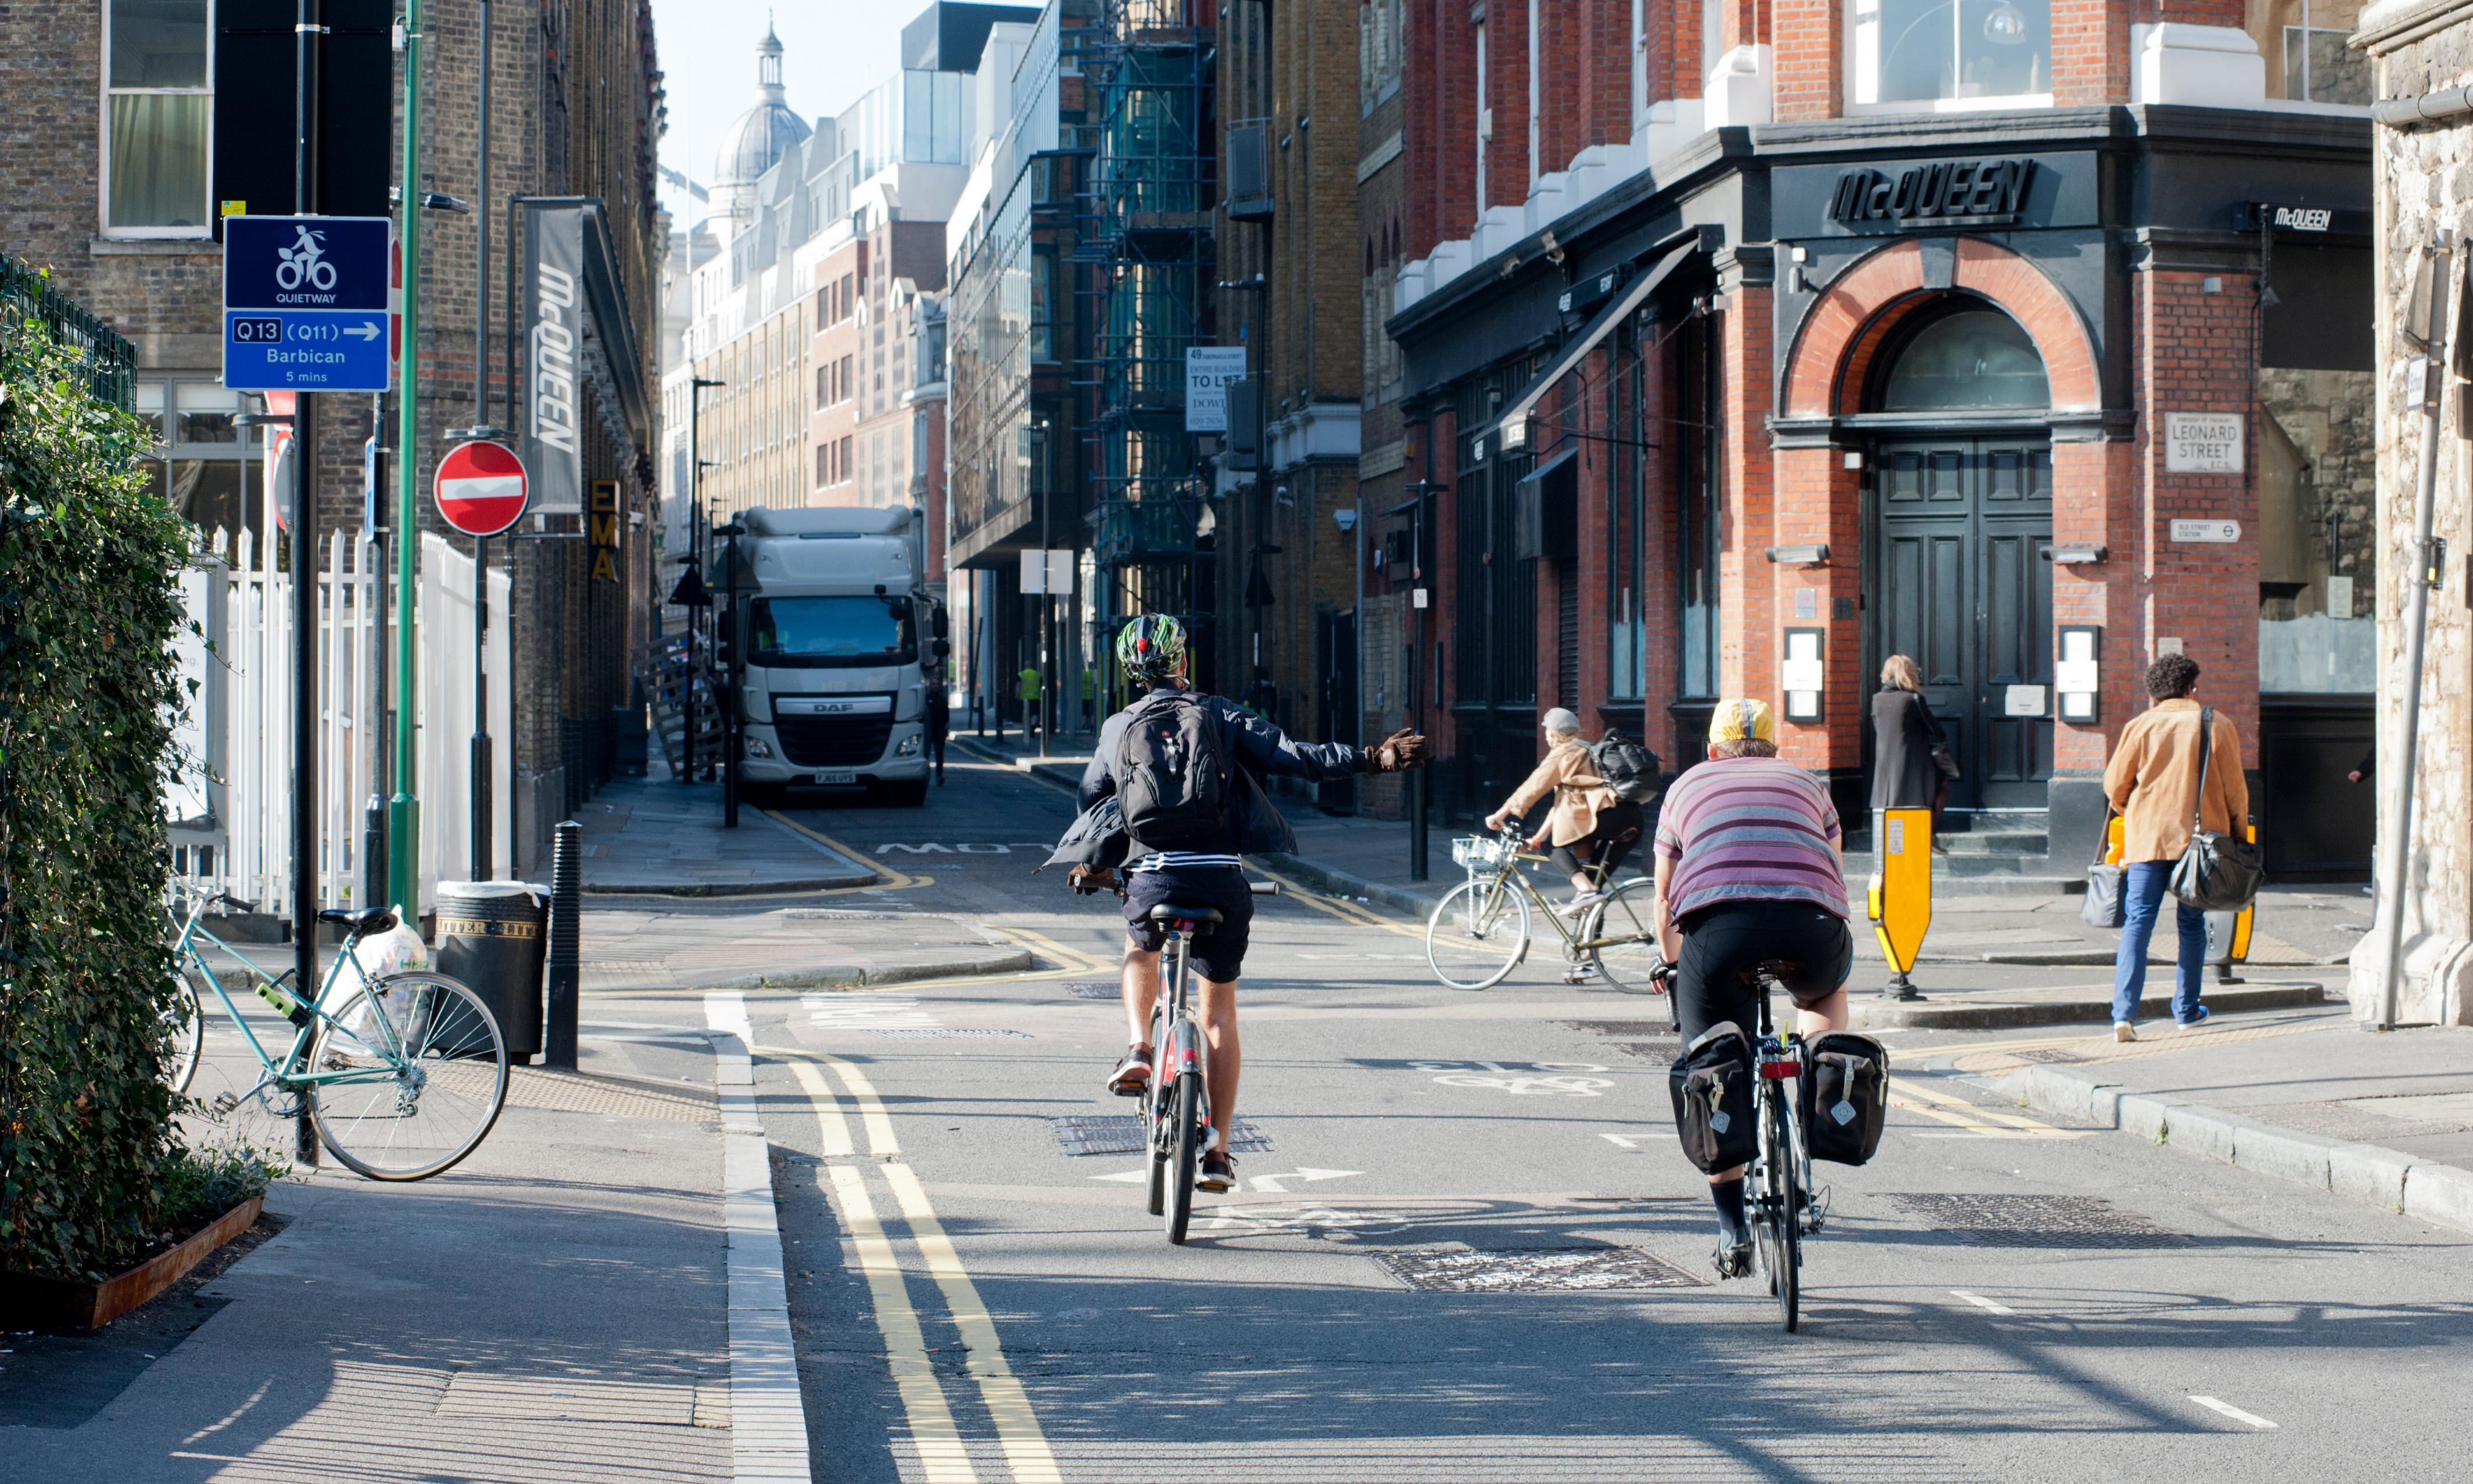 Sadiq Khan announces car-free day in London to tackle air pollution